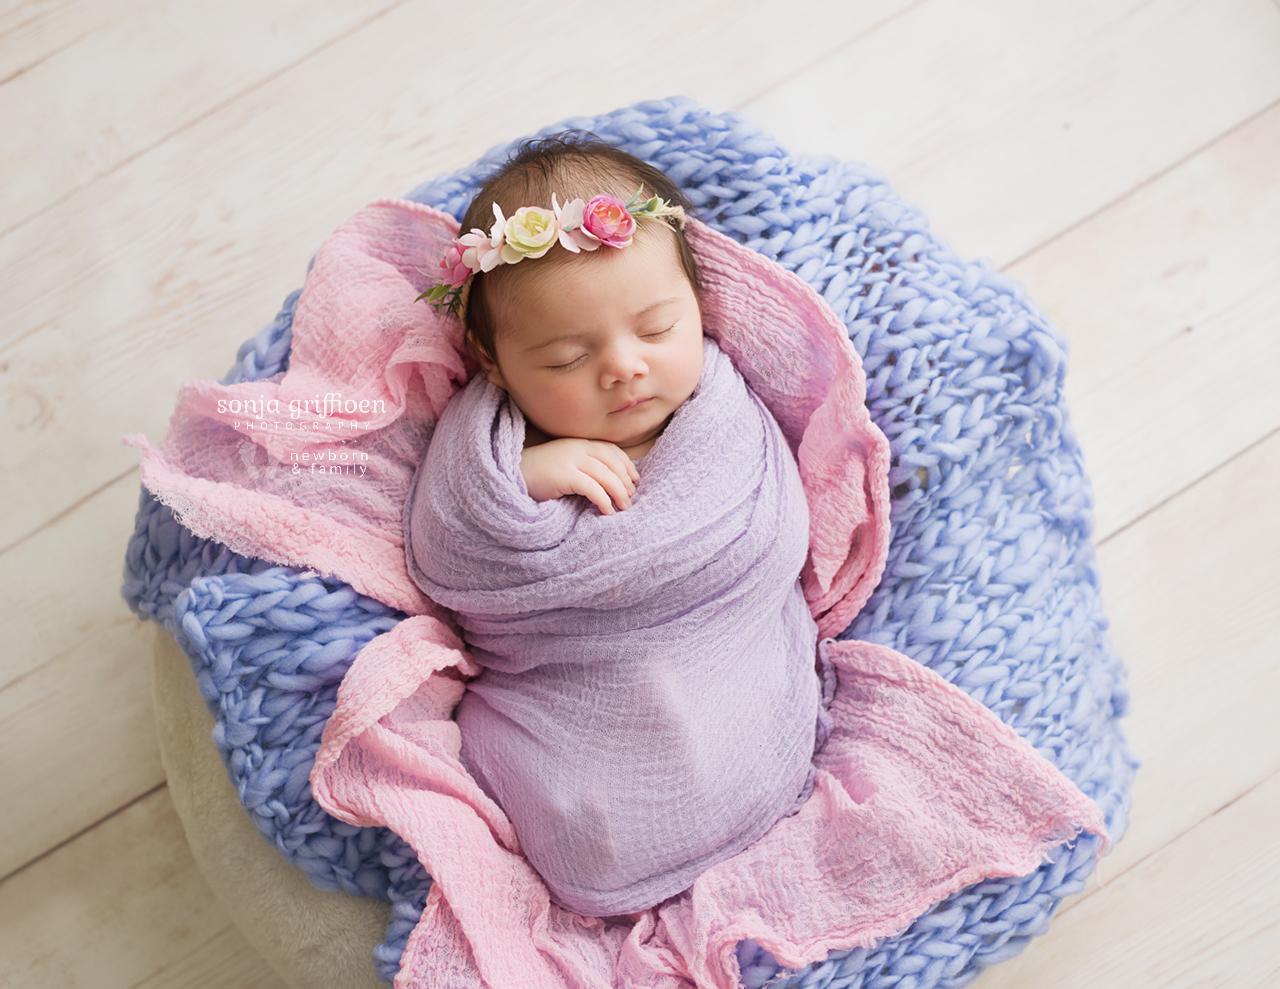 Rumeysa-Newborn-Brisbane-Newborn-Photographer-Sonja-Griffioen-06.jpg